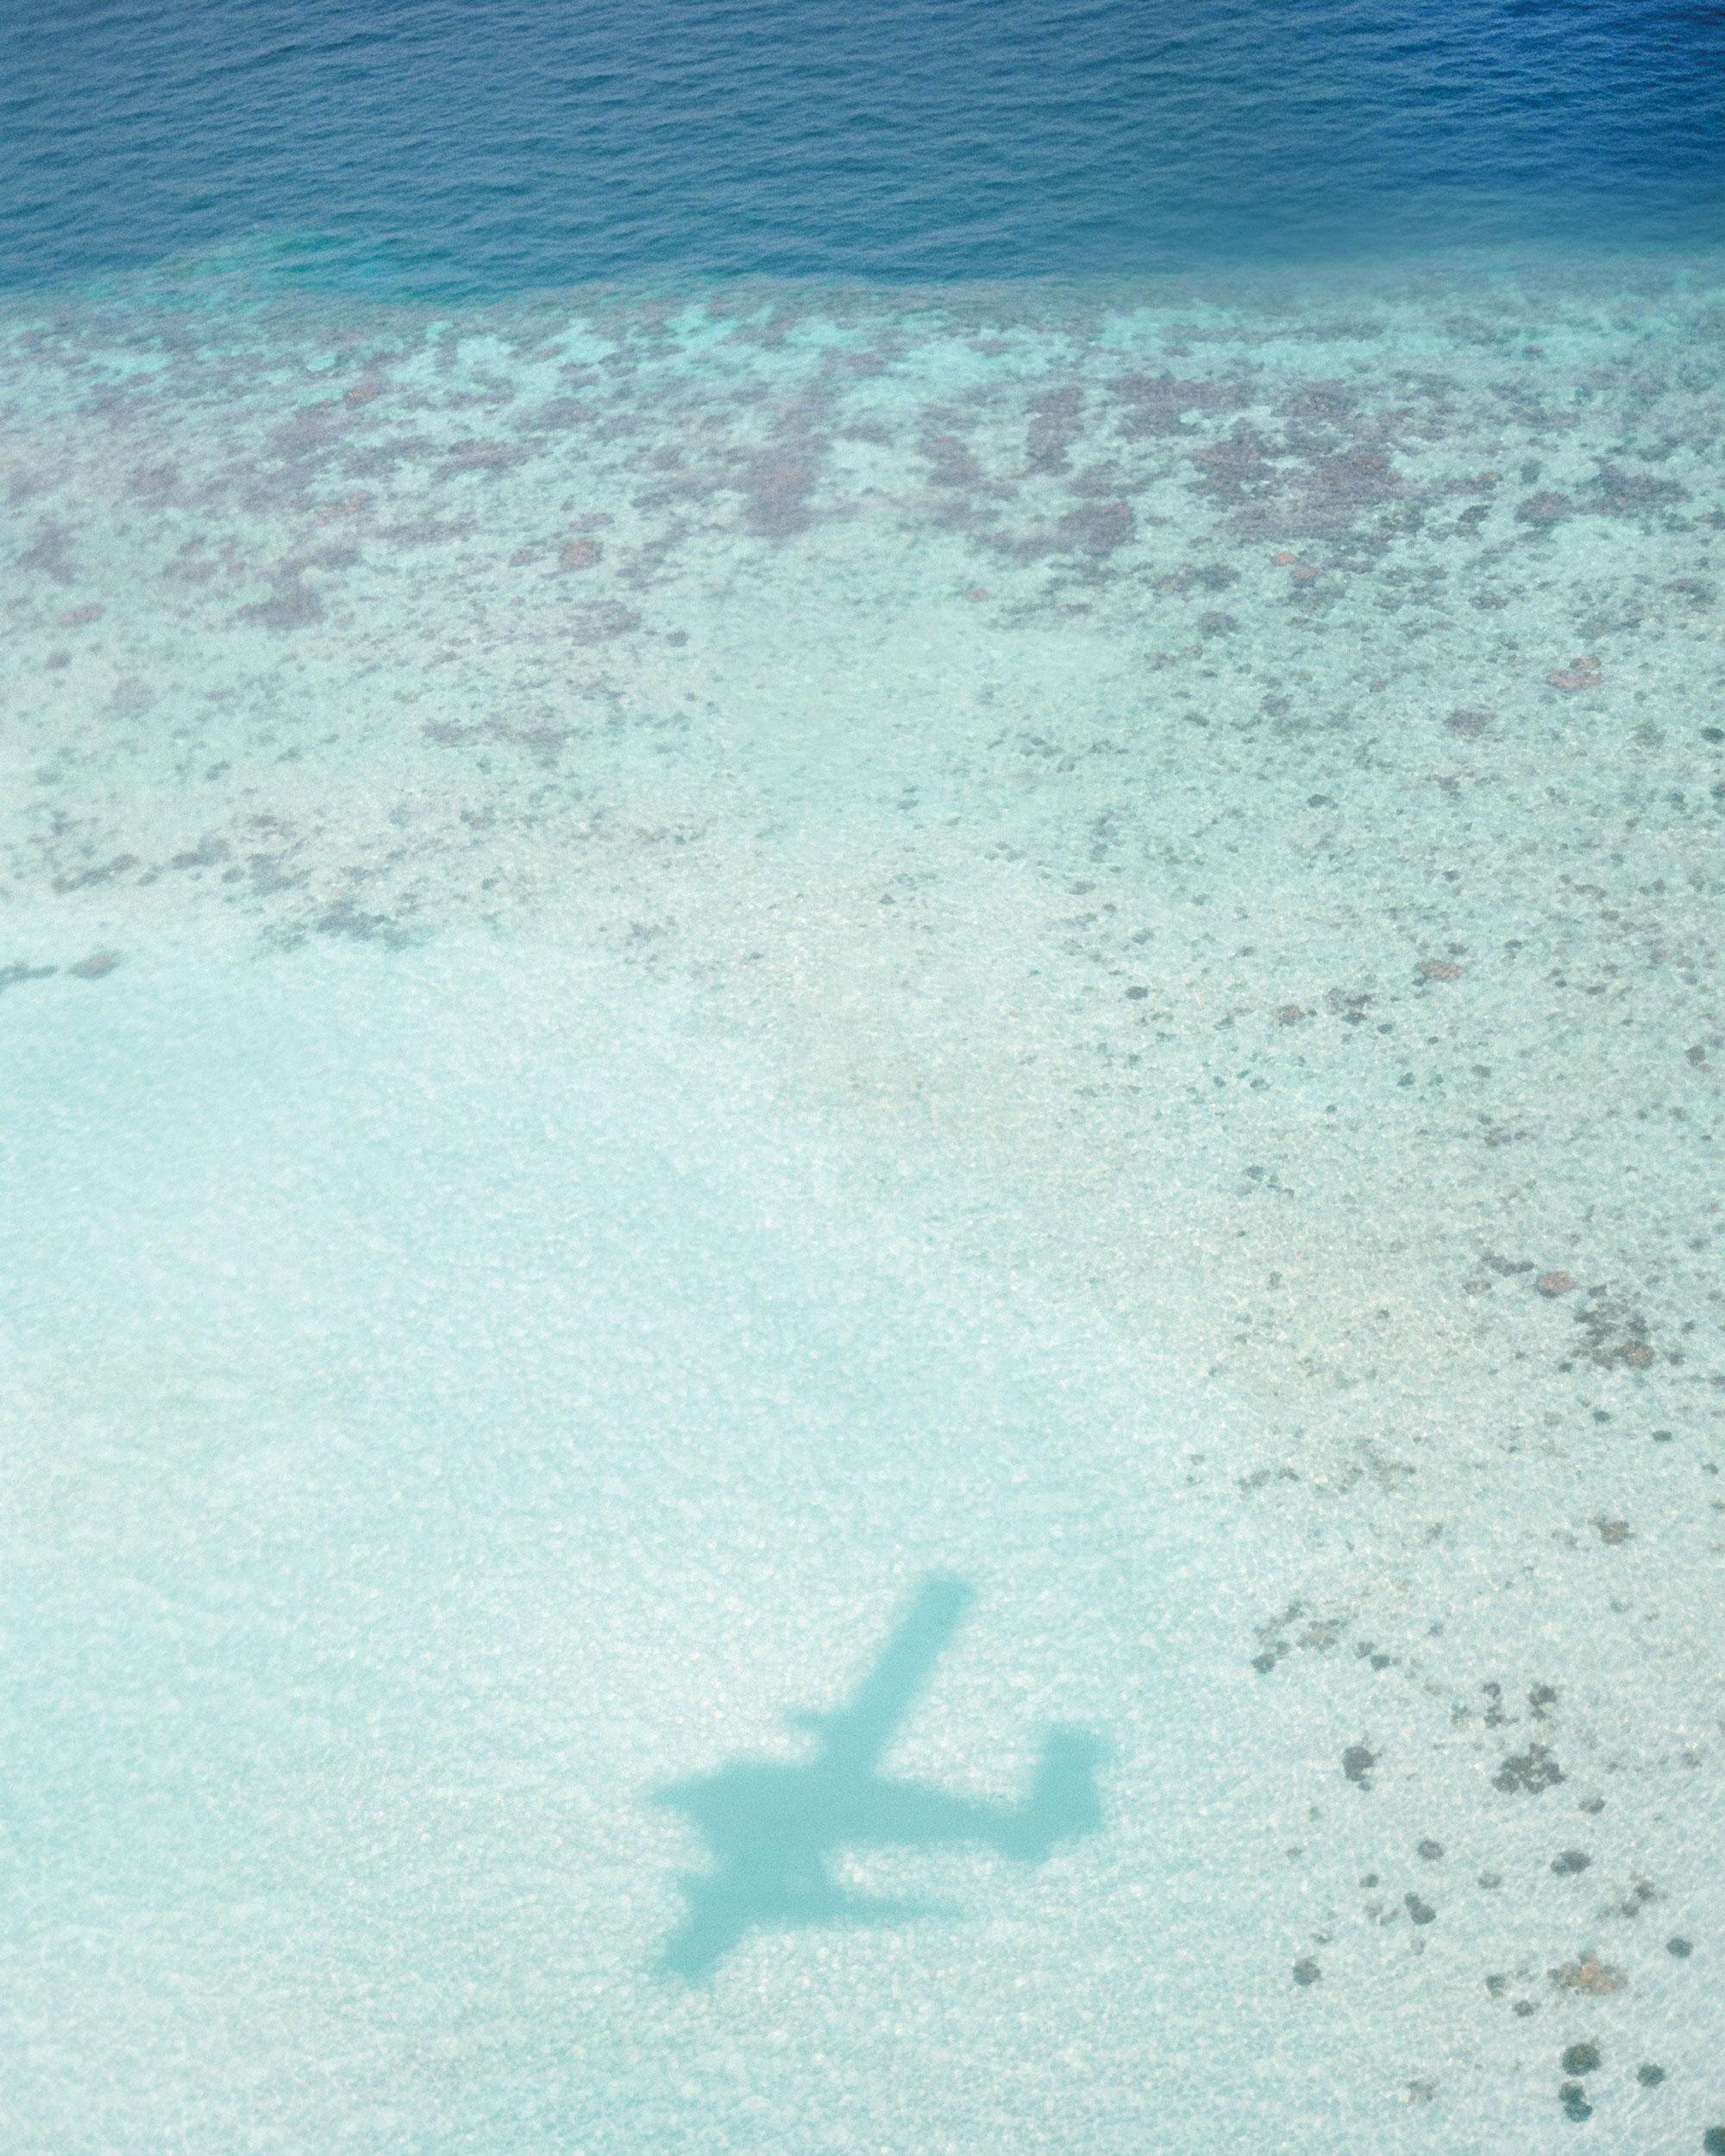 peony-richard-wedding-maldives-airplane-shadow-in-sand-0015-s112383.jpg